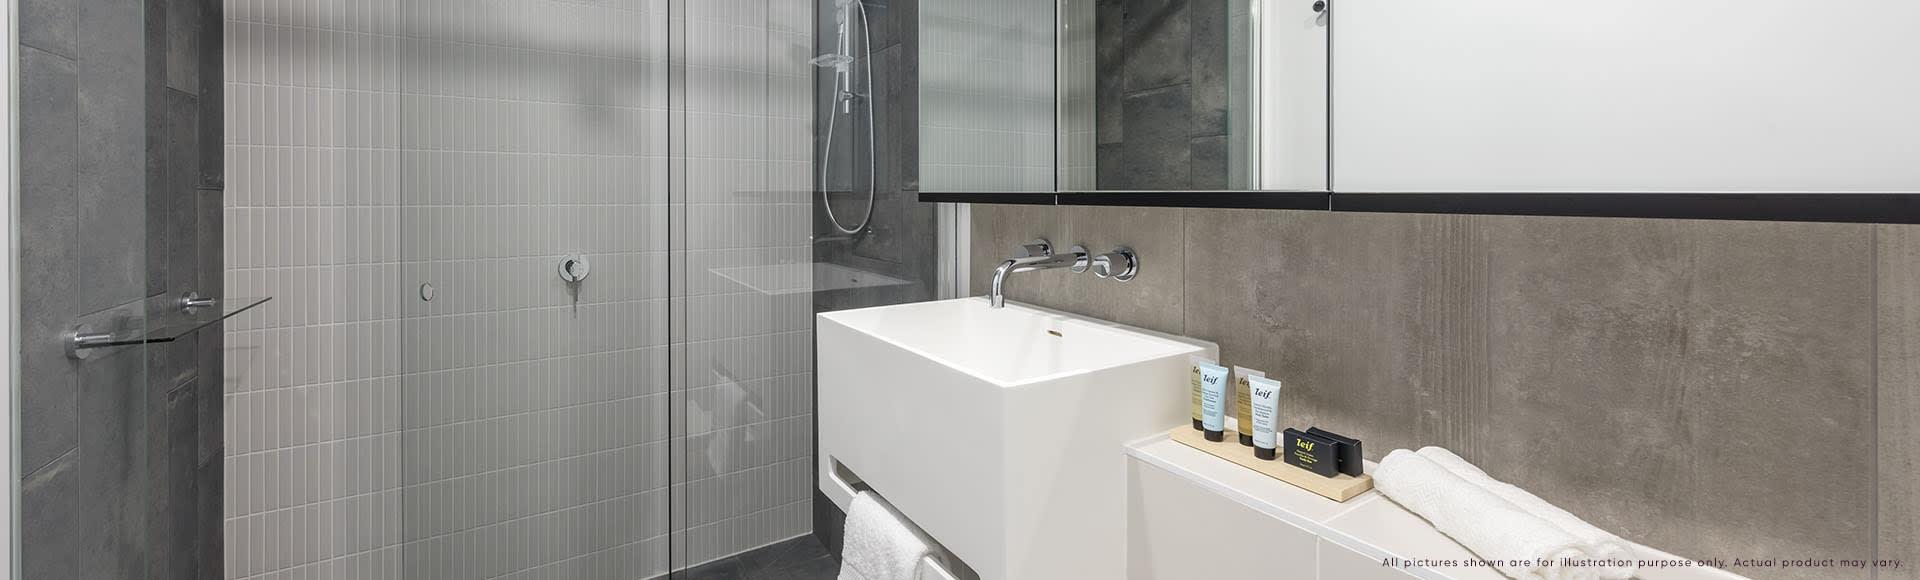 Avani Box Hill 2 Bedroom Suite Bathroom 1920x580px